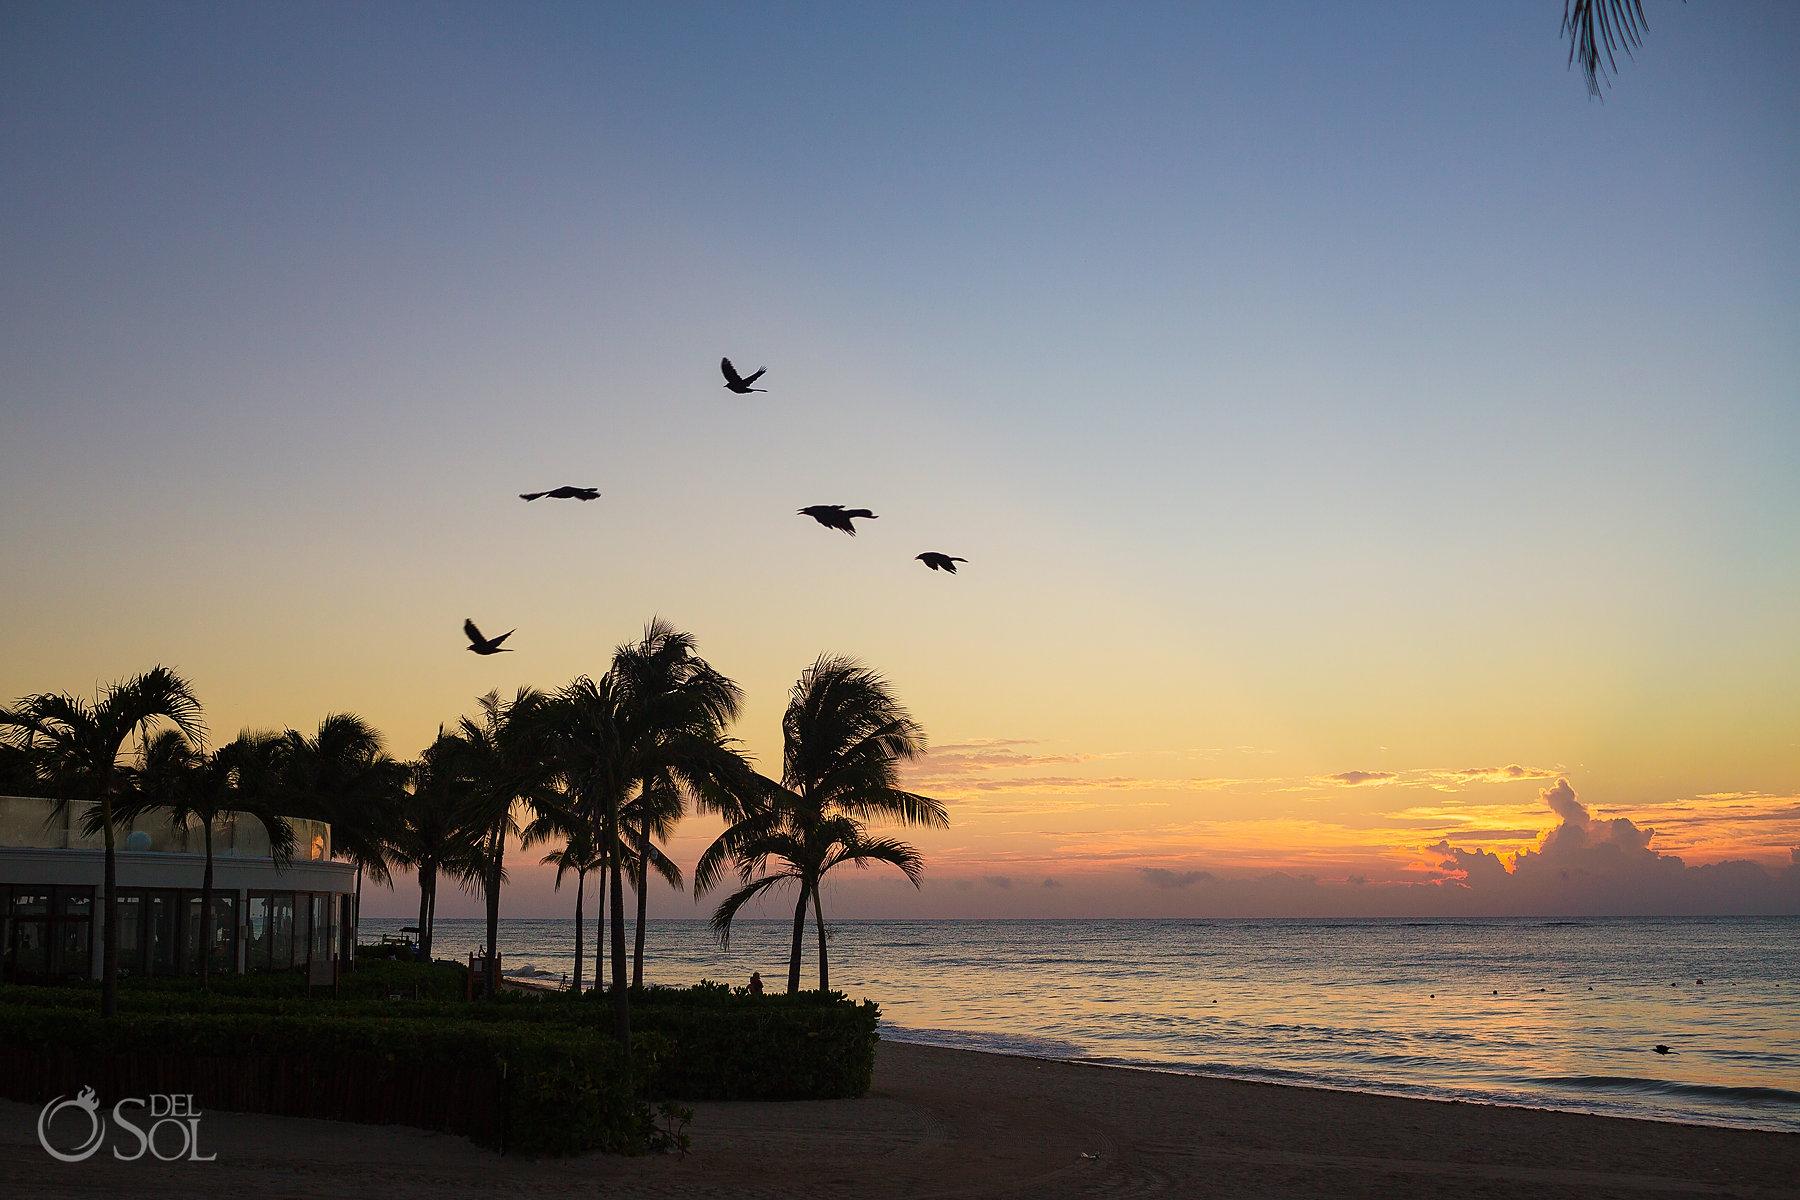 Beach tulum sunrise, palm trees sihouette